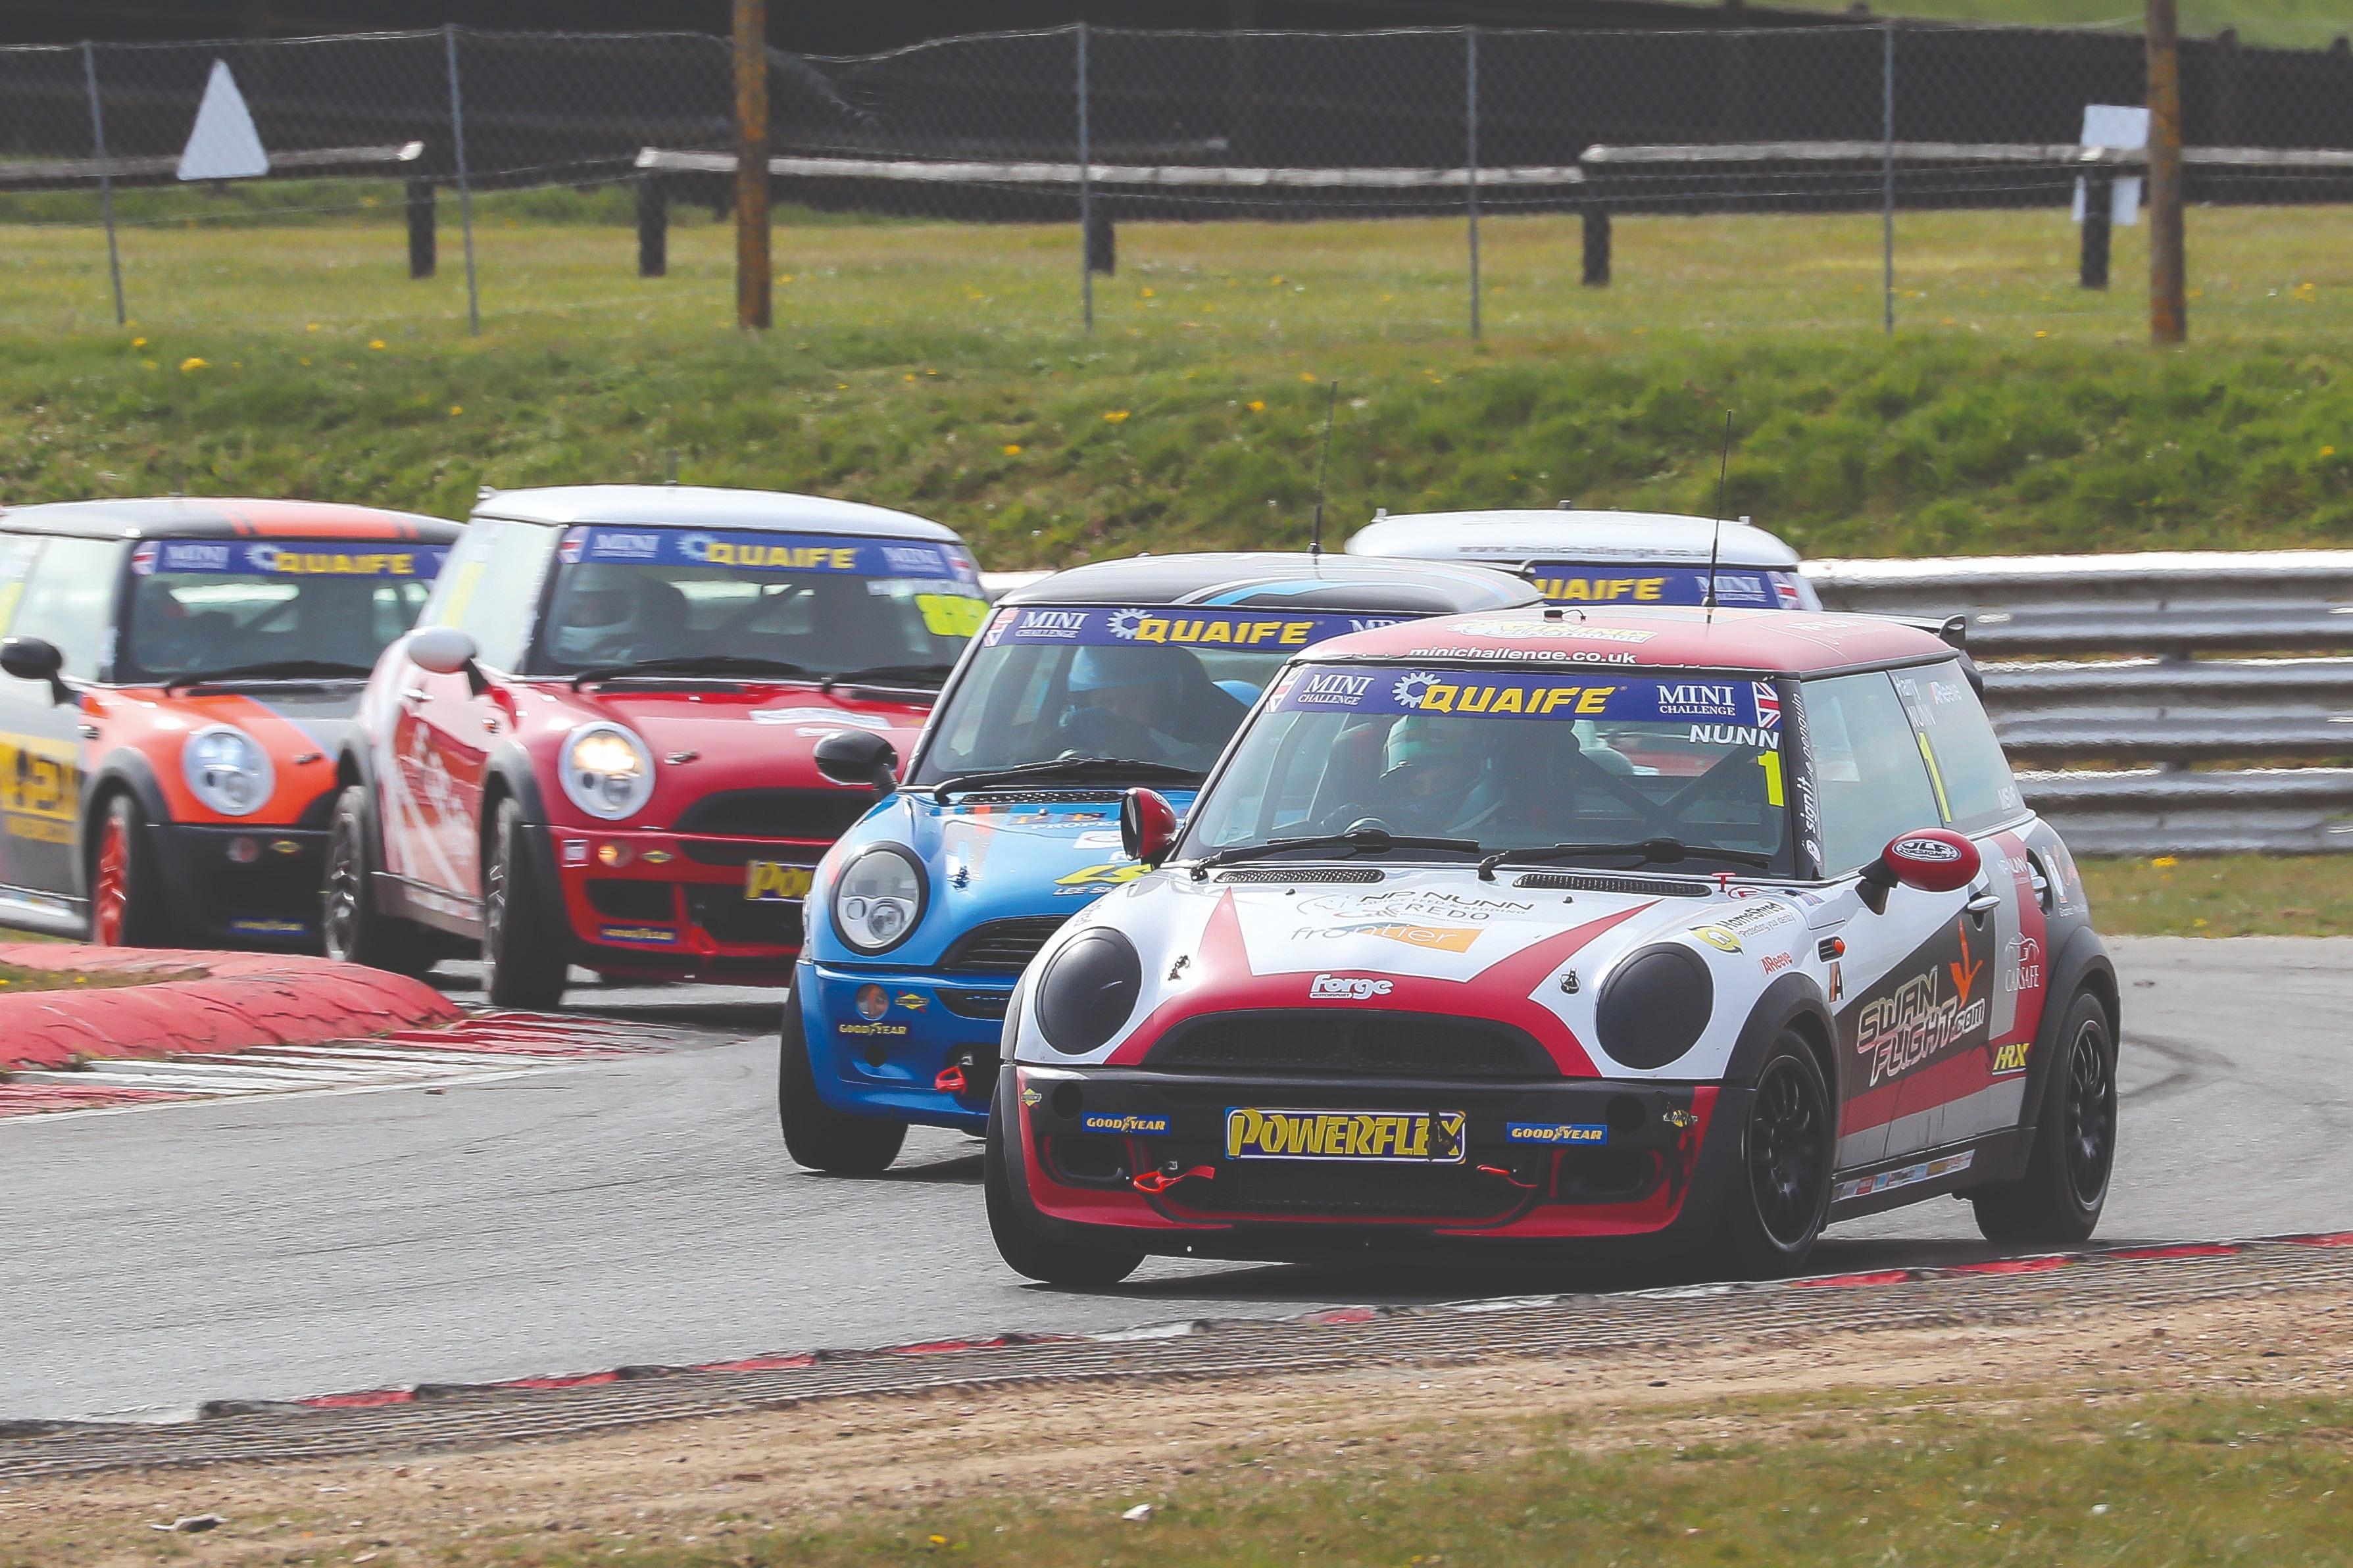 Harry Nunn, Lee Pearce Mini Challenge Snetterton 2021